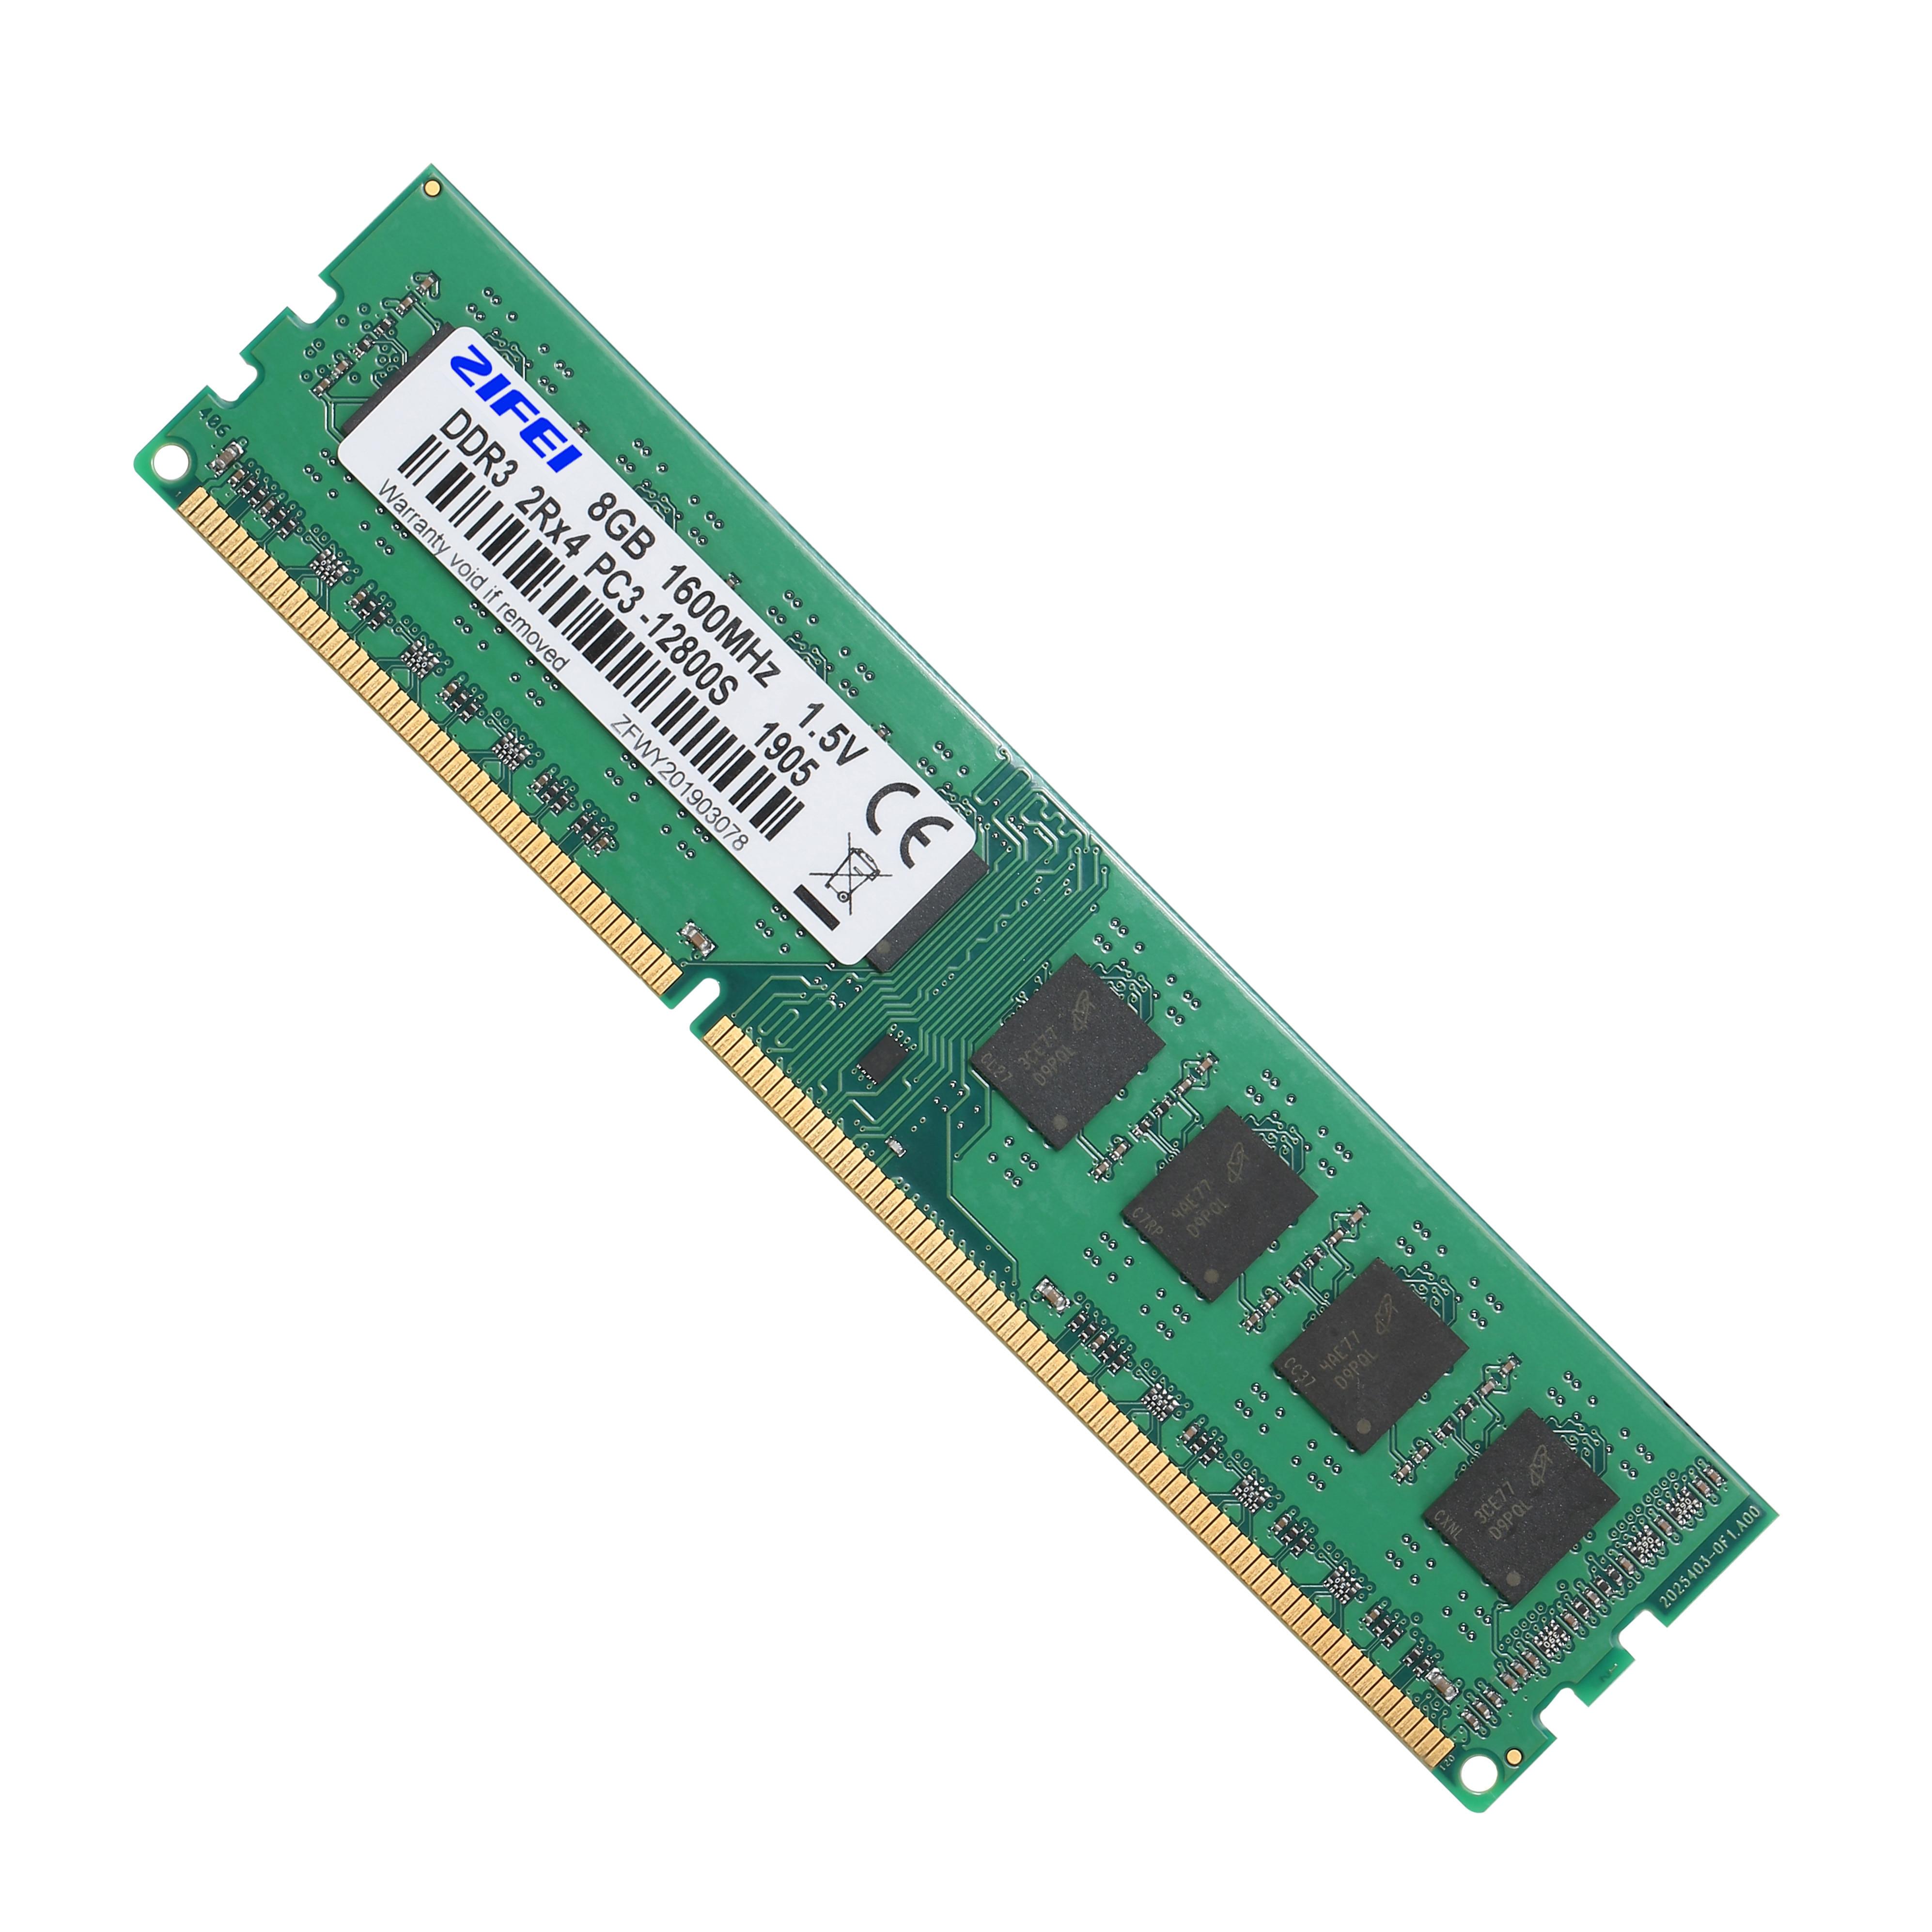 ZIFEI DDR3 8 Гб 1600 МГц 1333 МГц DIMM настольная Память RAM для розетки AM3 AM3 + FM1 FM2 AMD Материнская плата 16 Гб